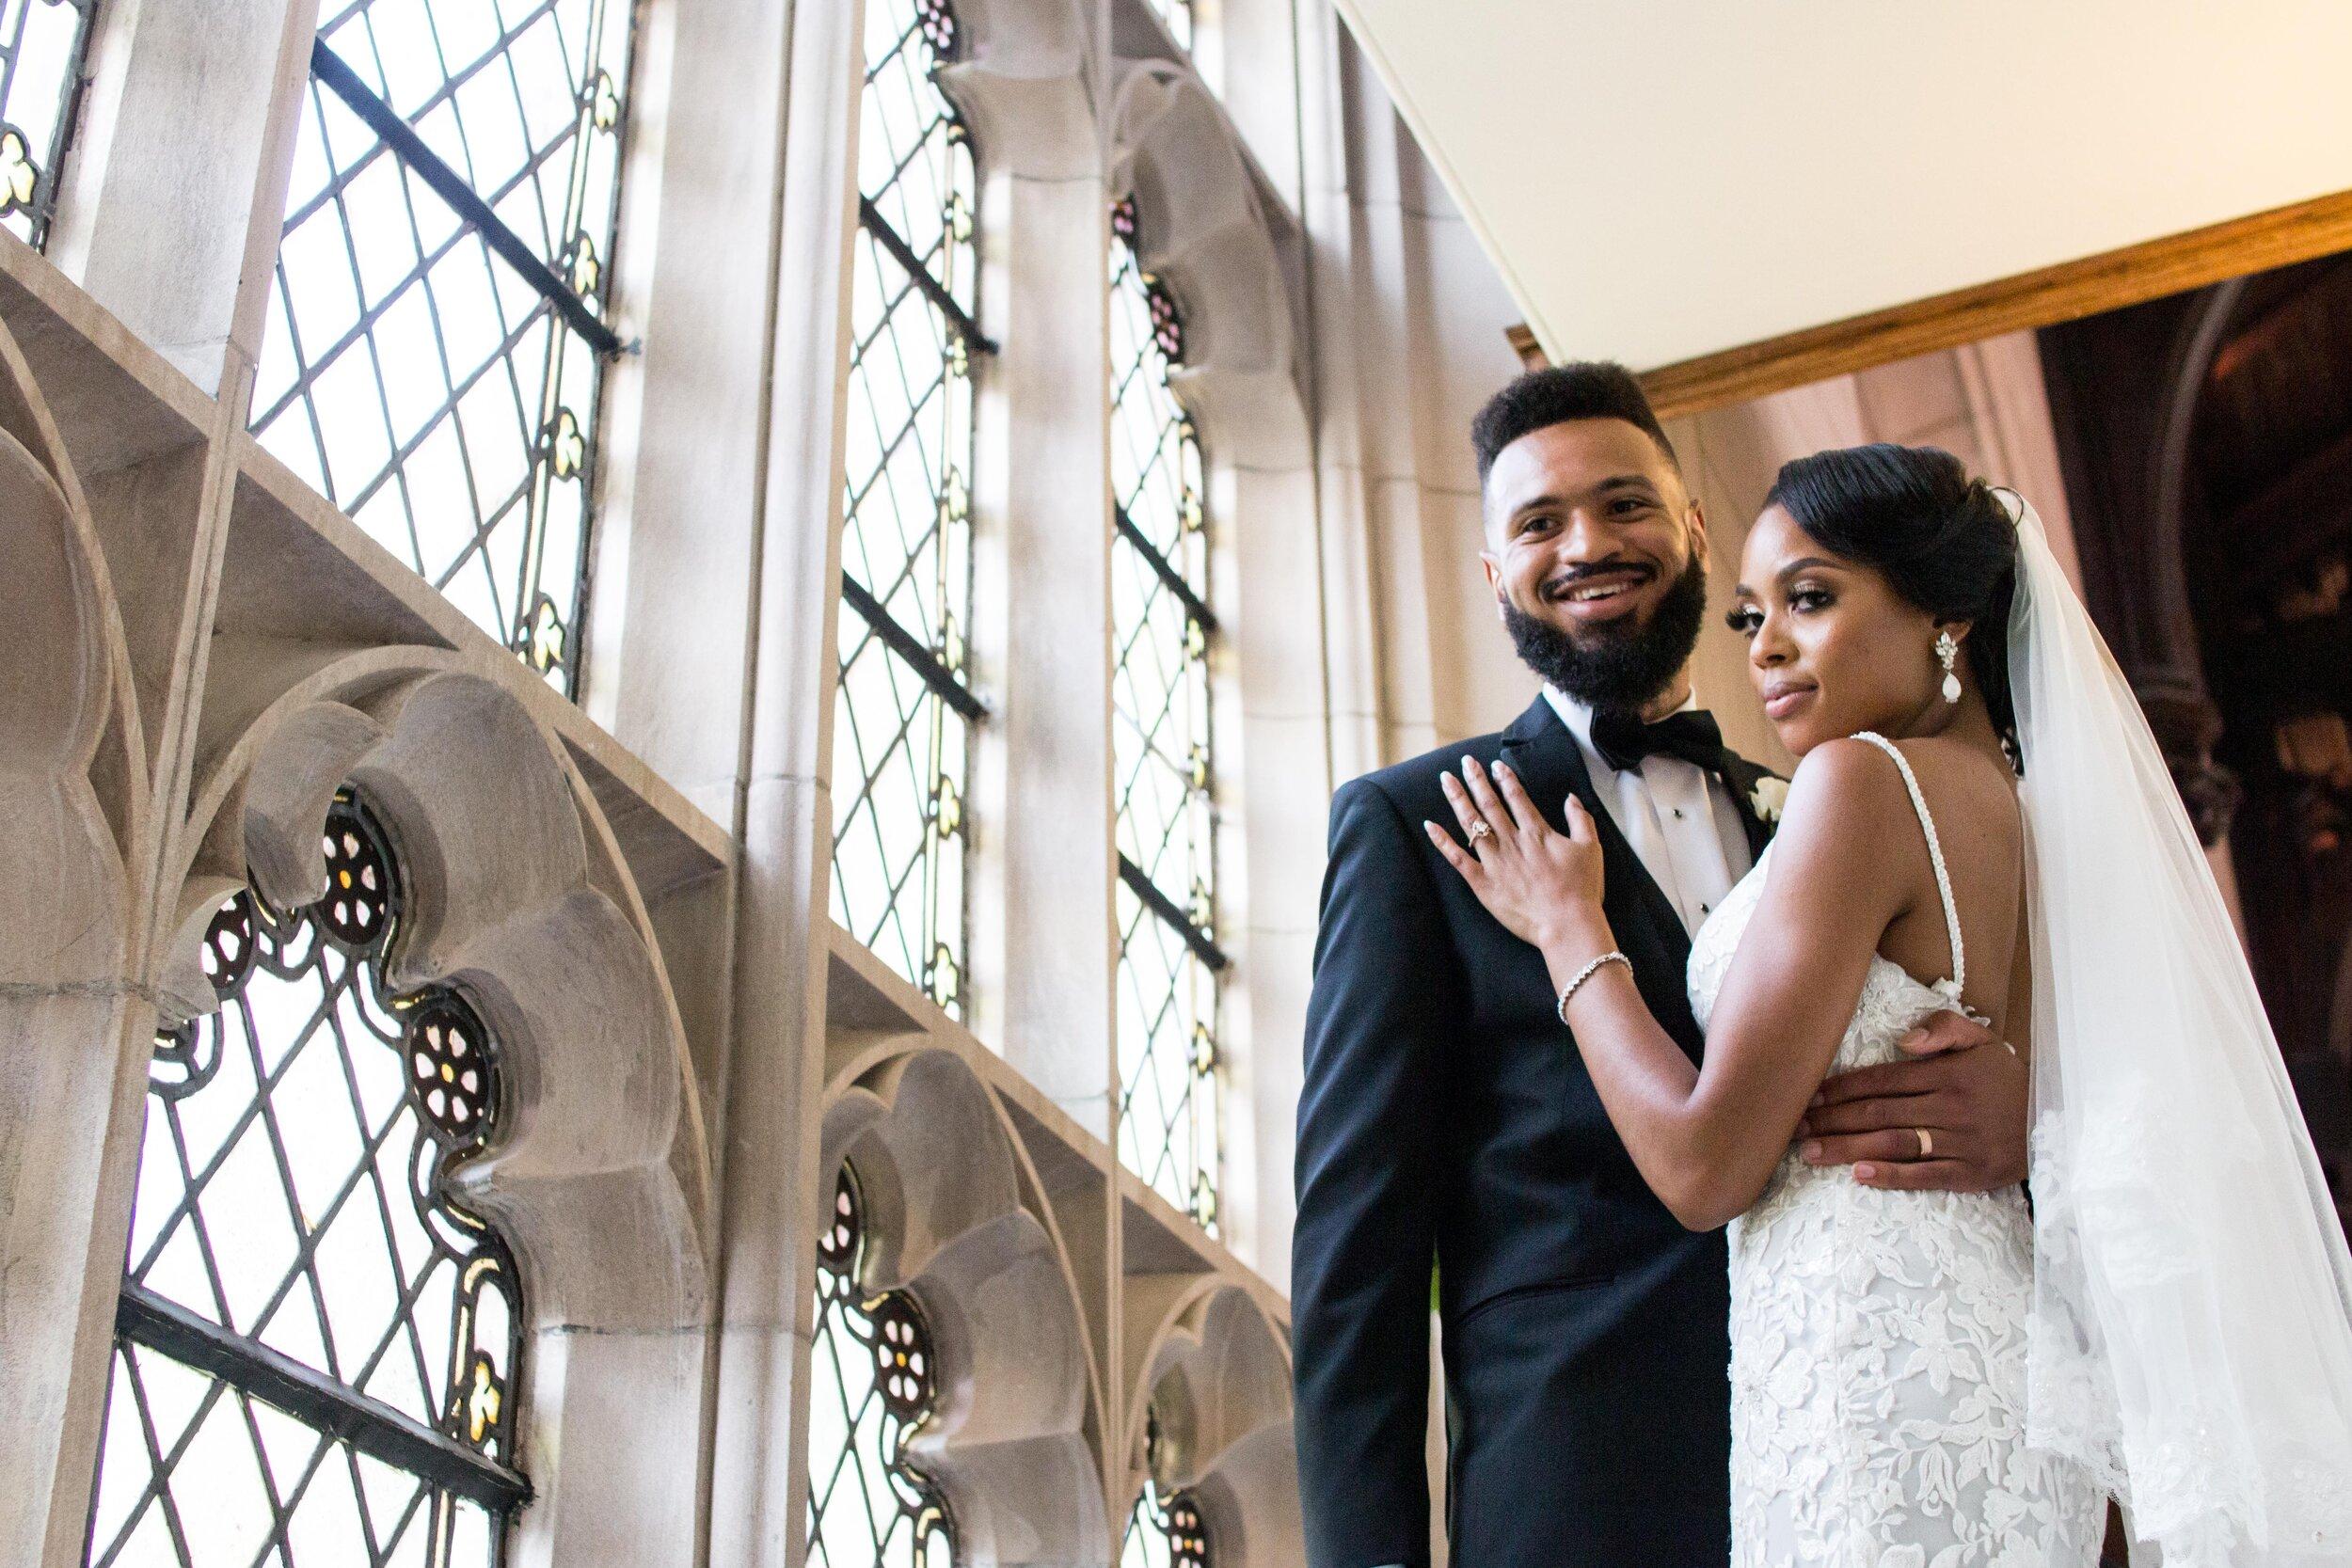 8_3_2019_BONTY_WEDDING-429.jpg